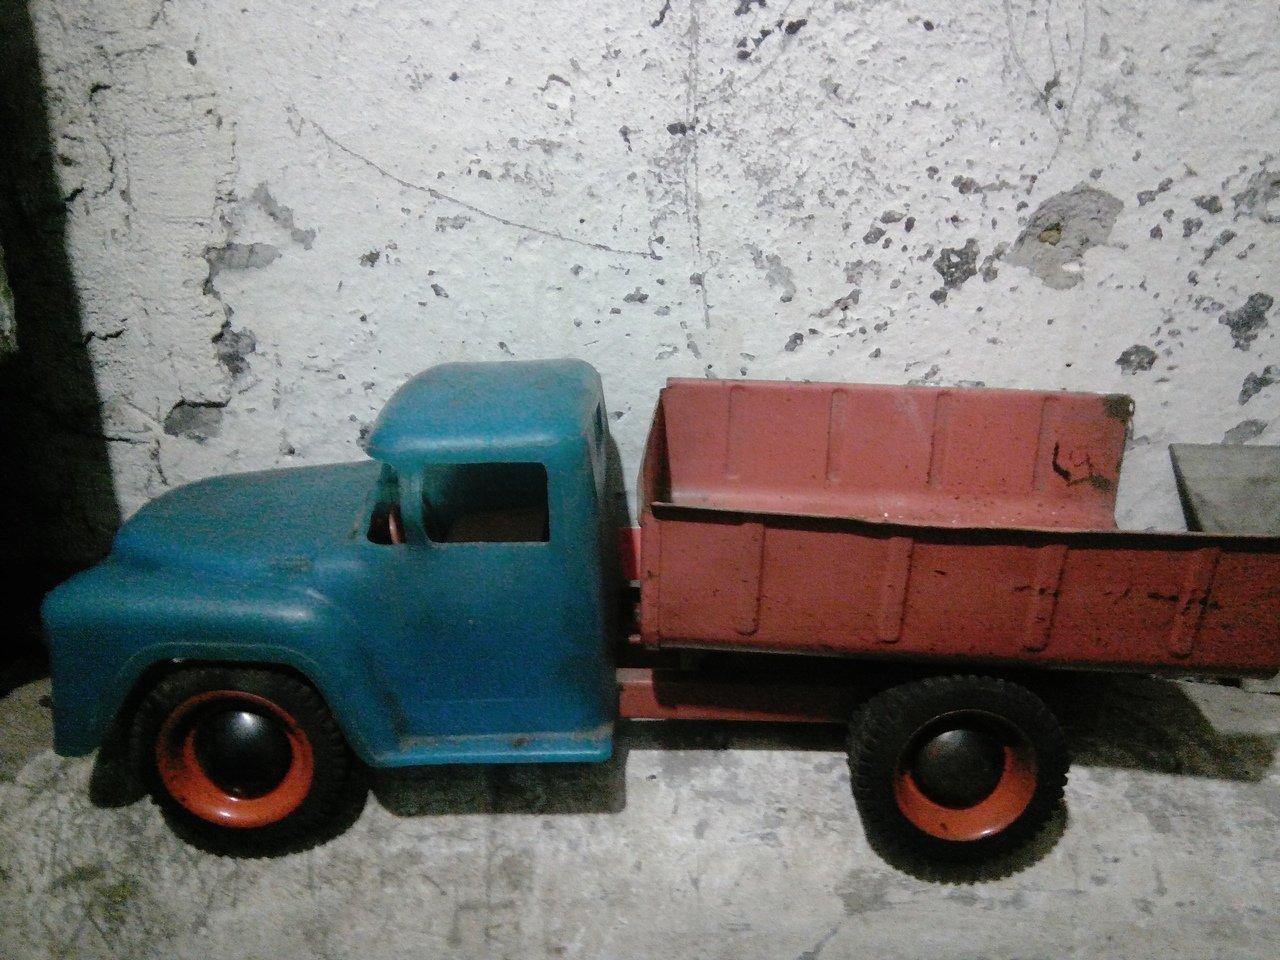 советские машинки игрушки фото каждого нас